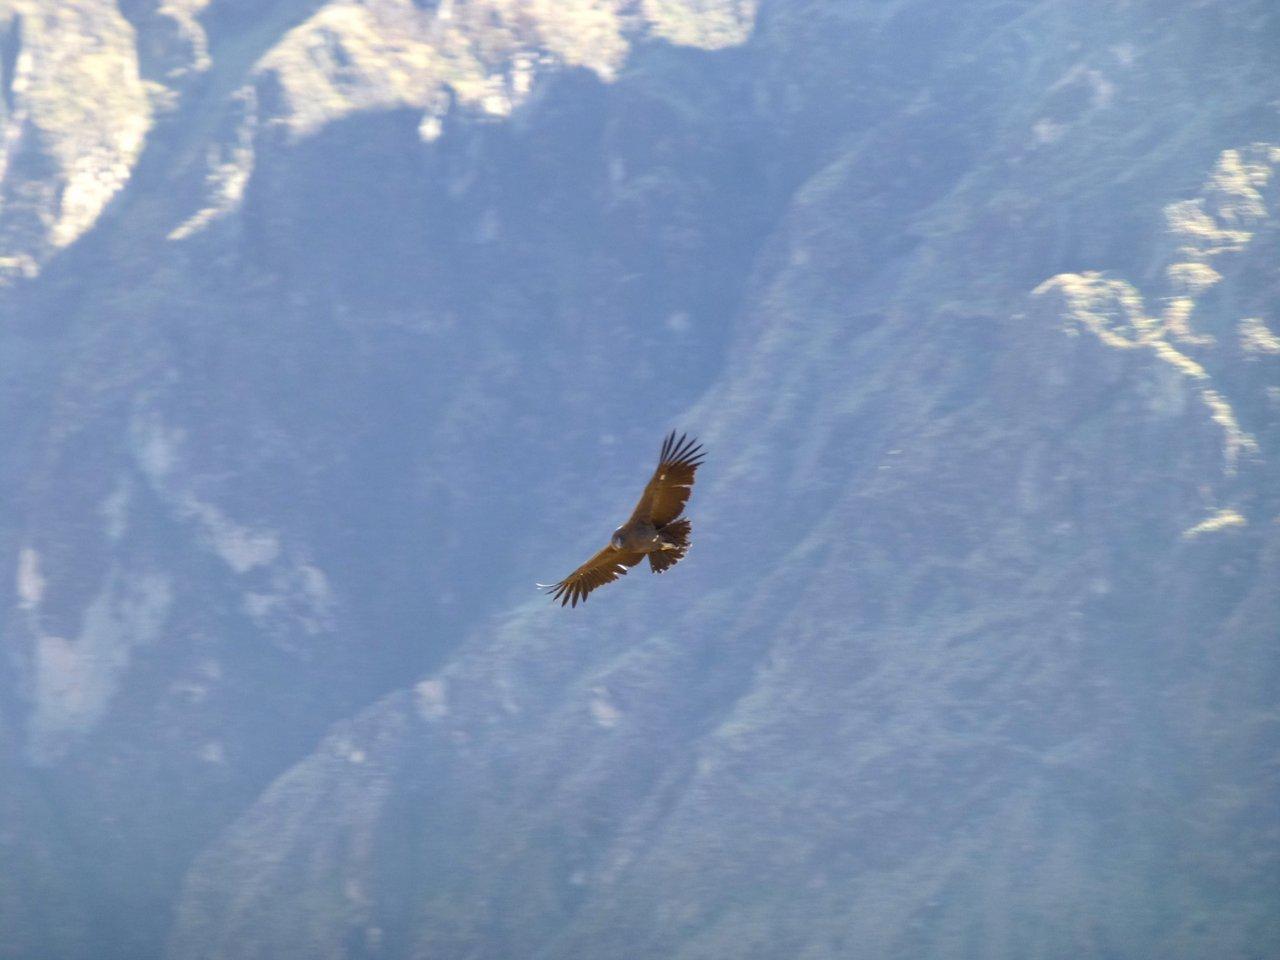 canyon del colca trekking: condor